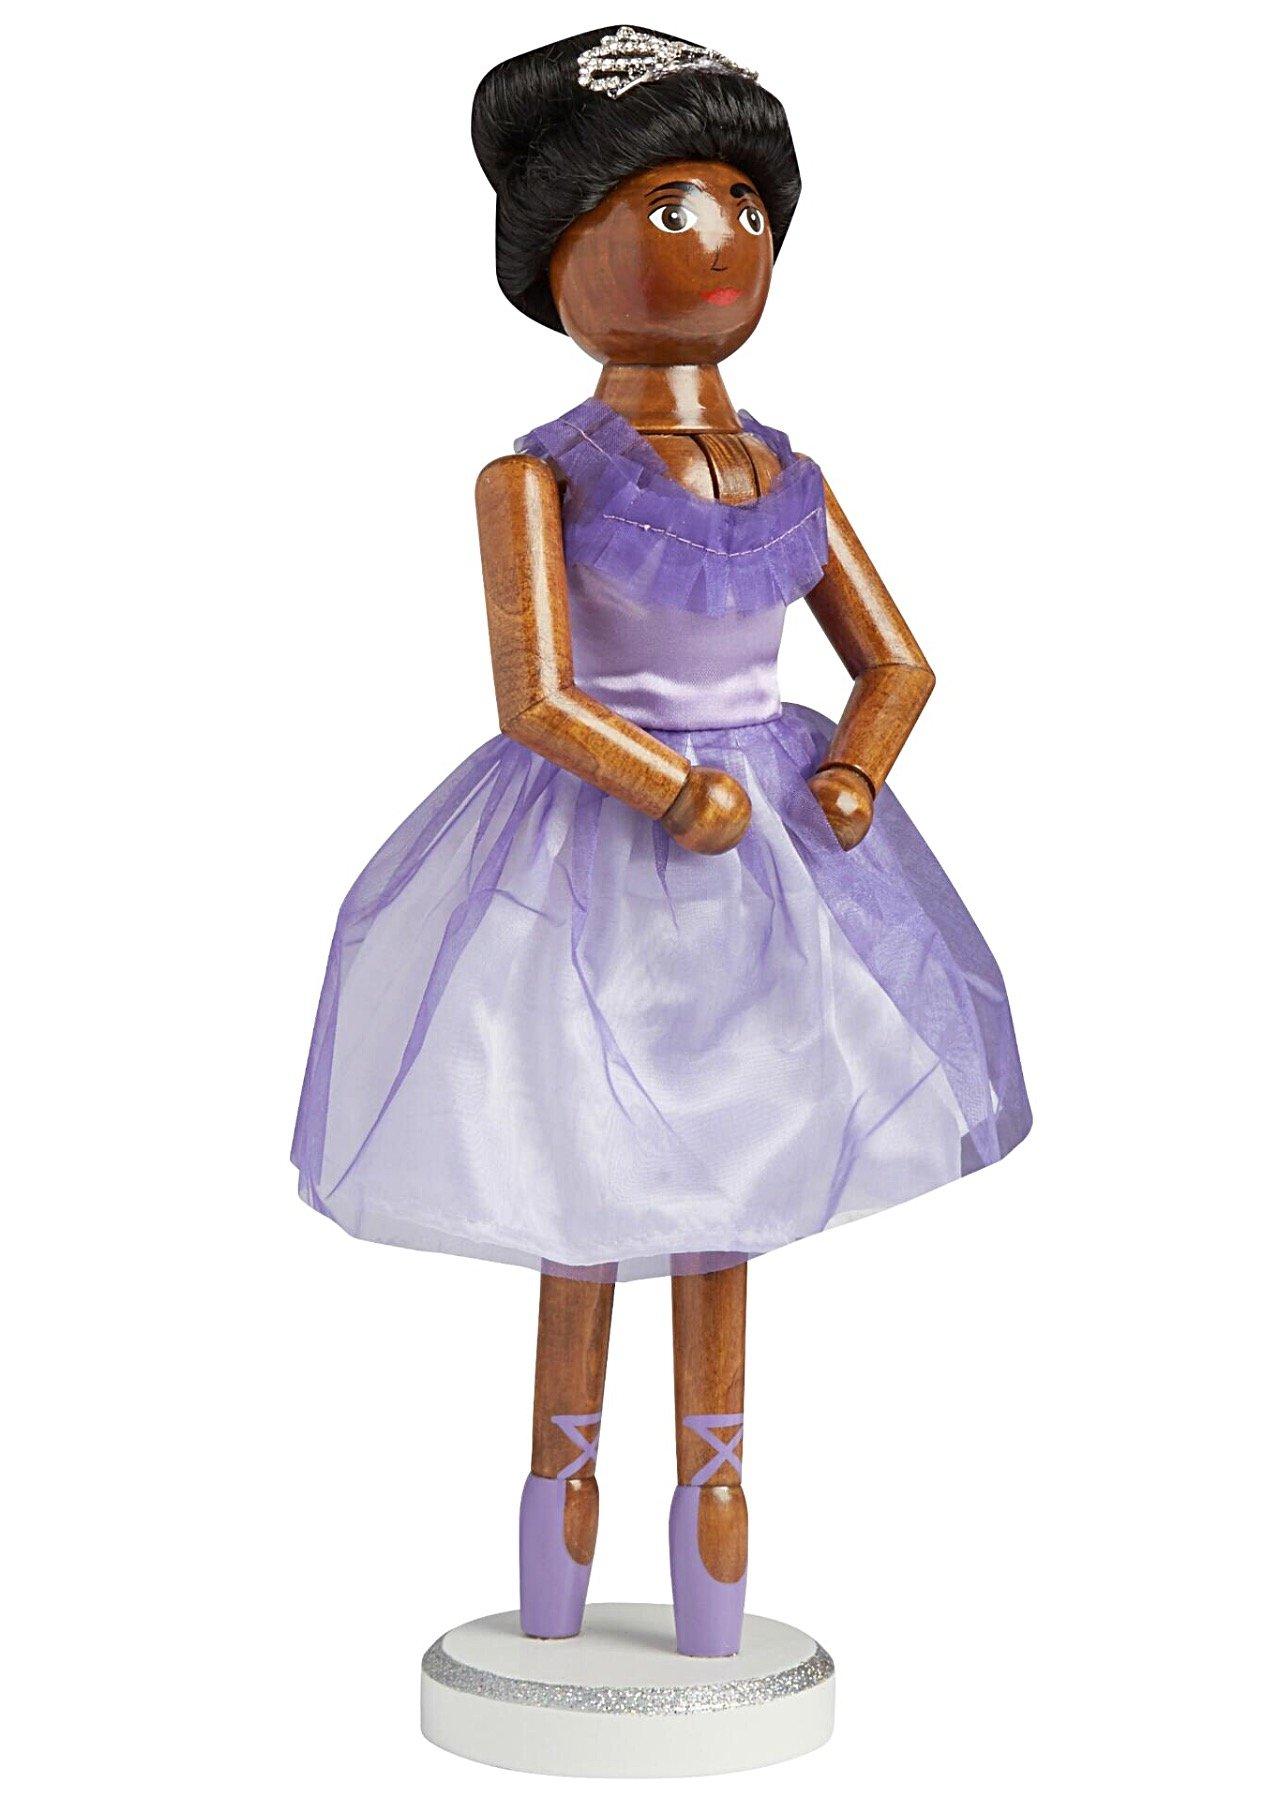 African American Black Girl Ballerina Dancer Large Unique Decorative Holiday Season Wooden Christmas Nutcracker